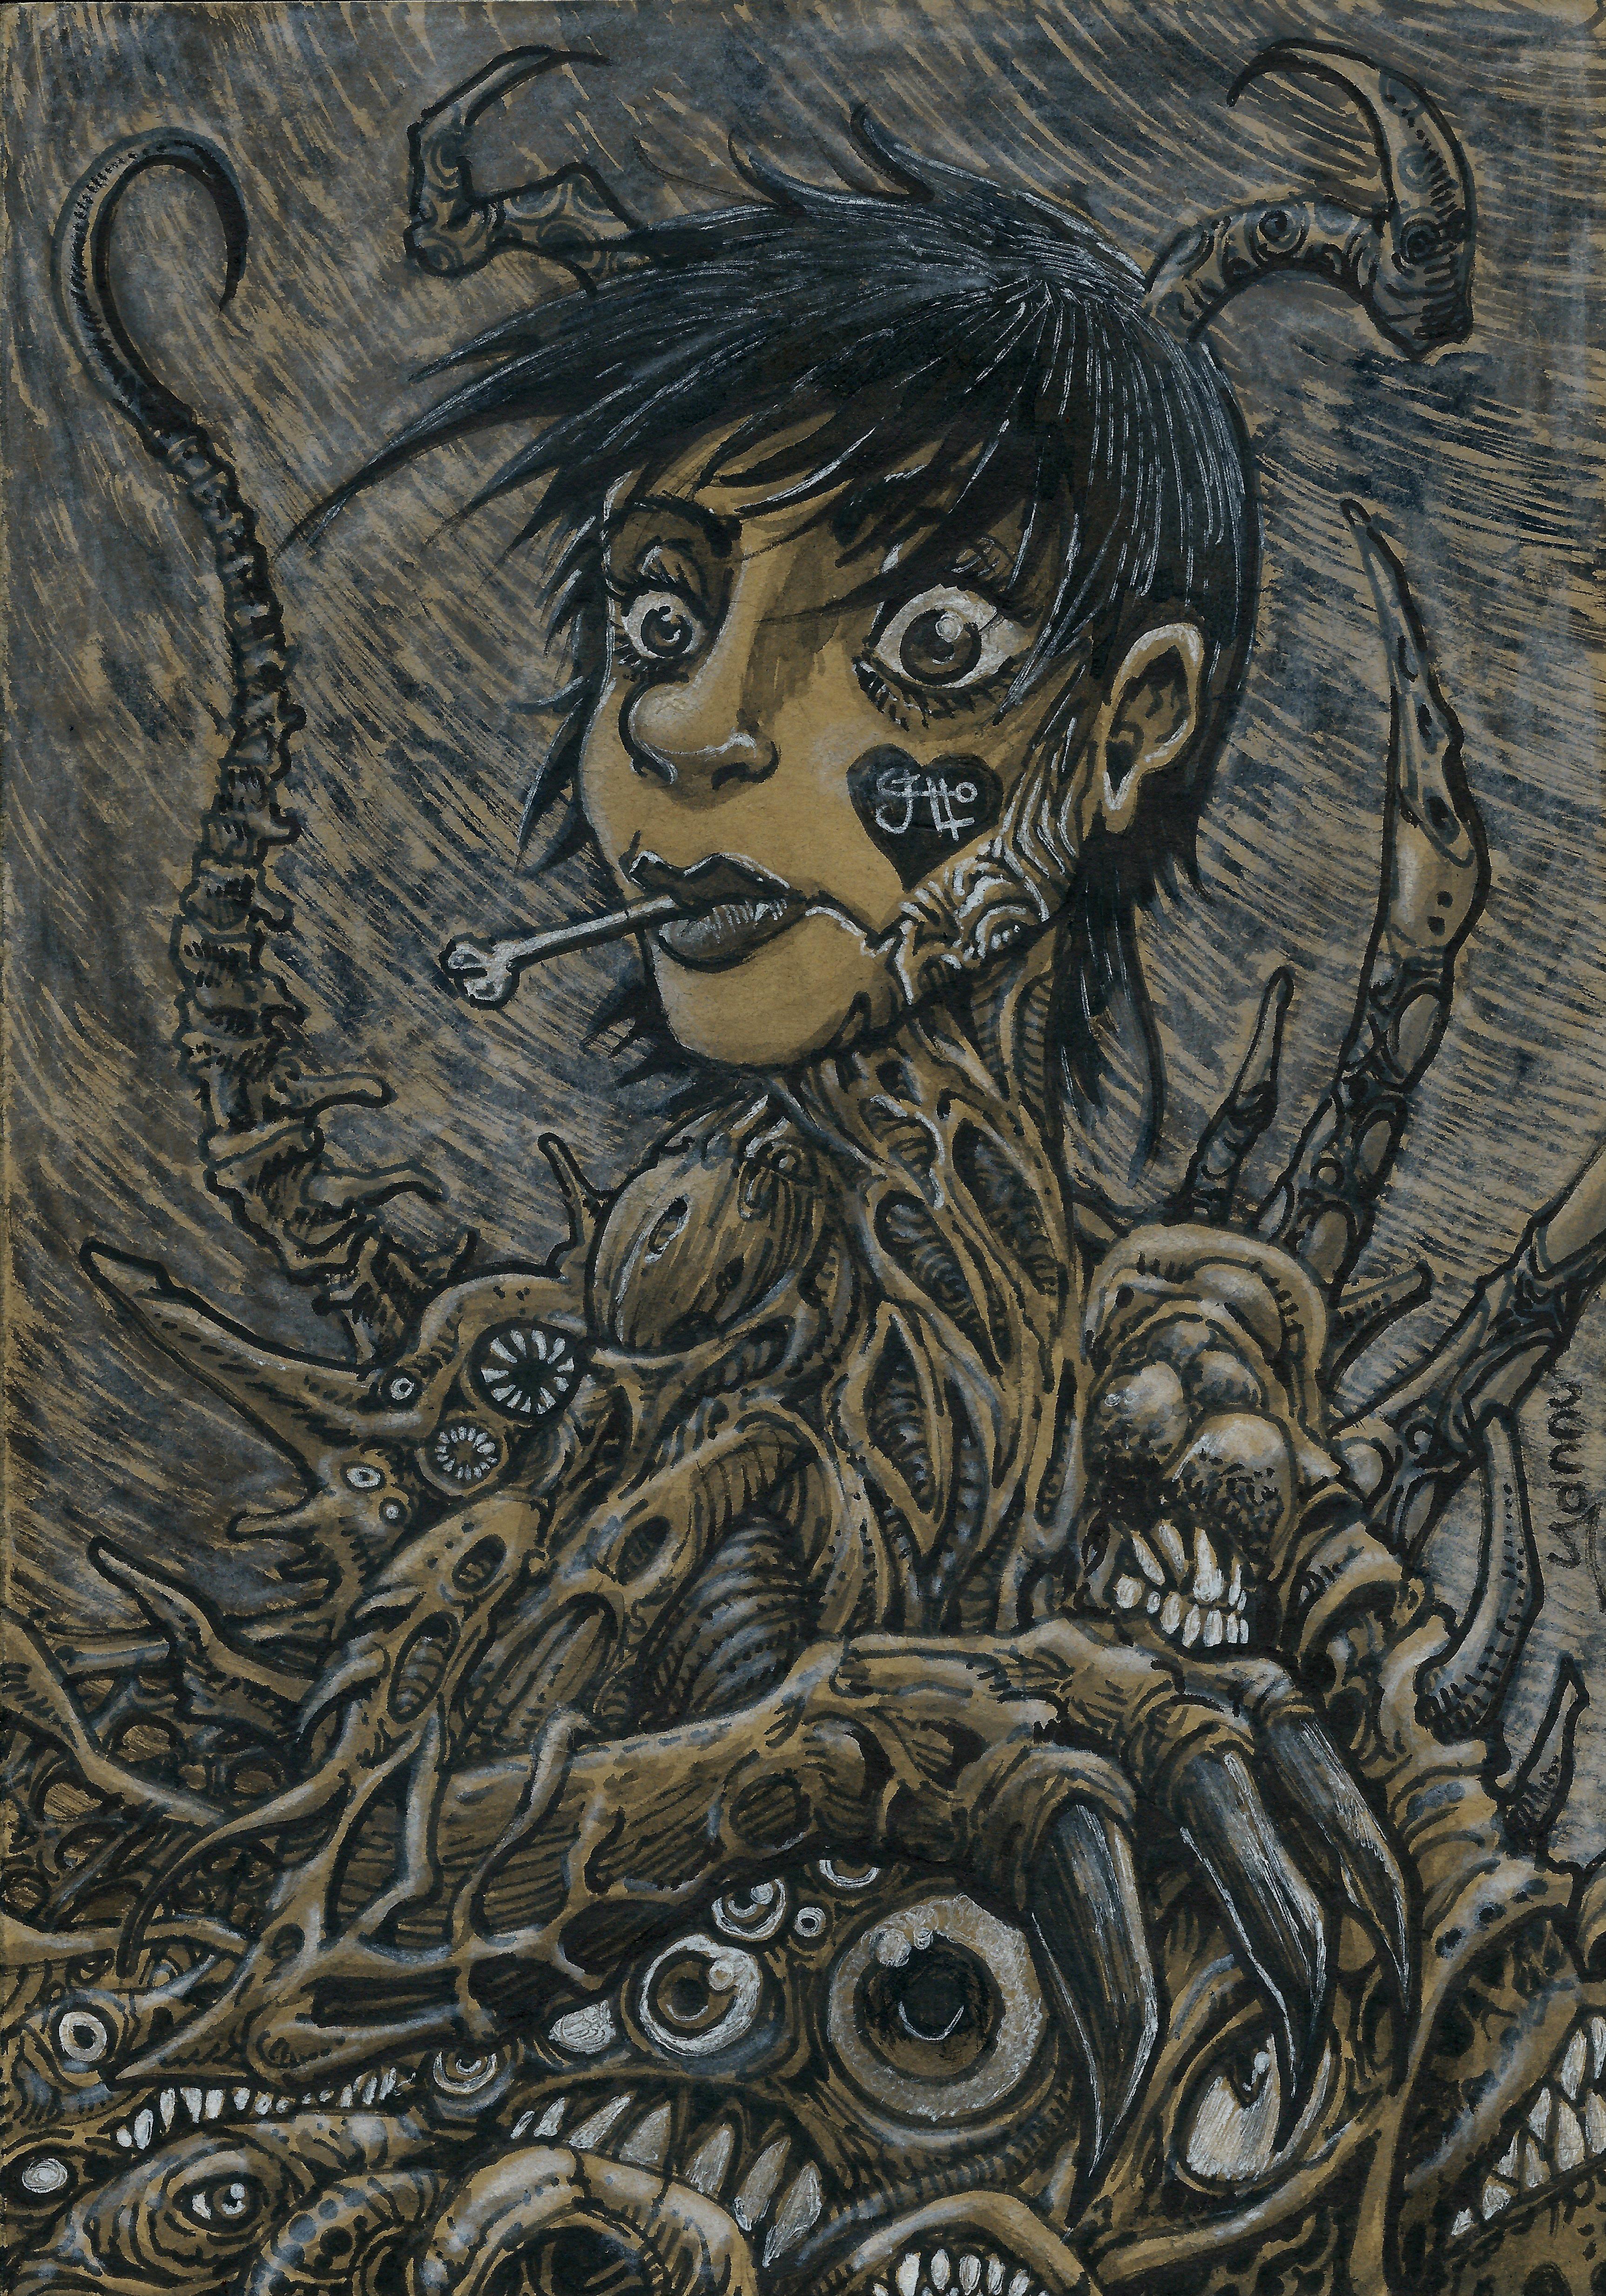 Halloween Daily monster #27